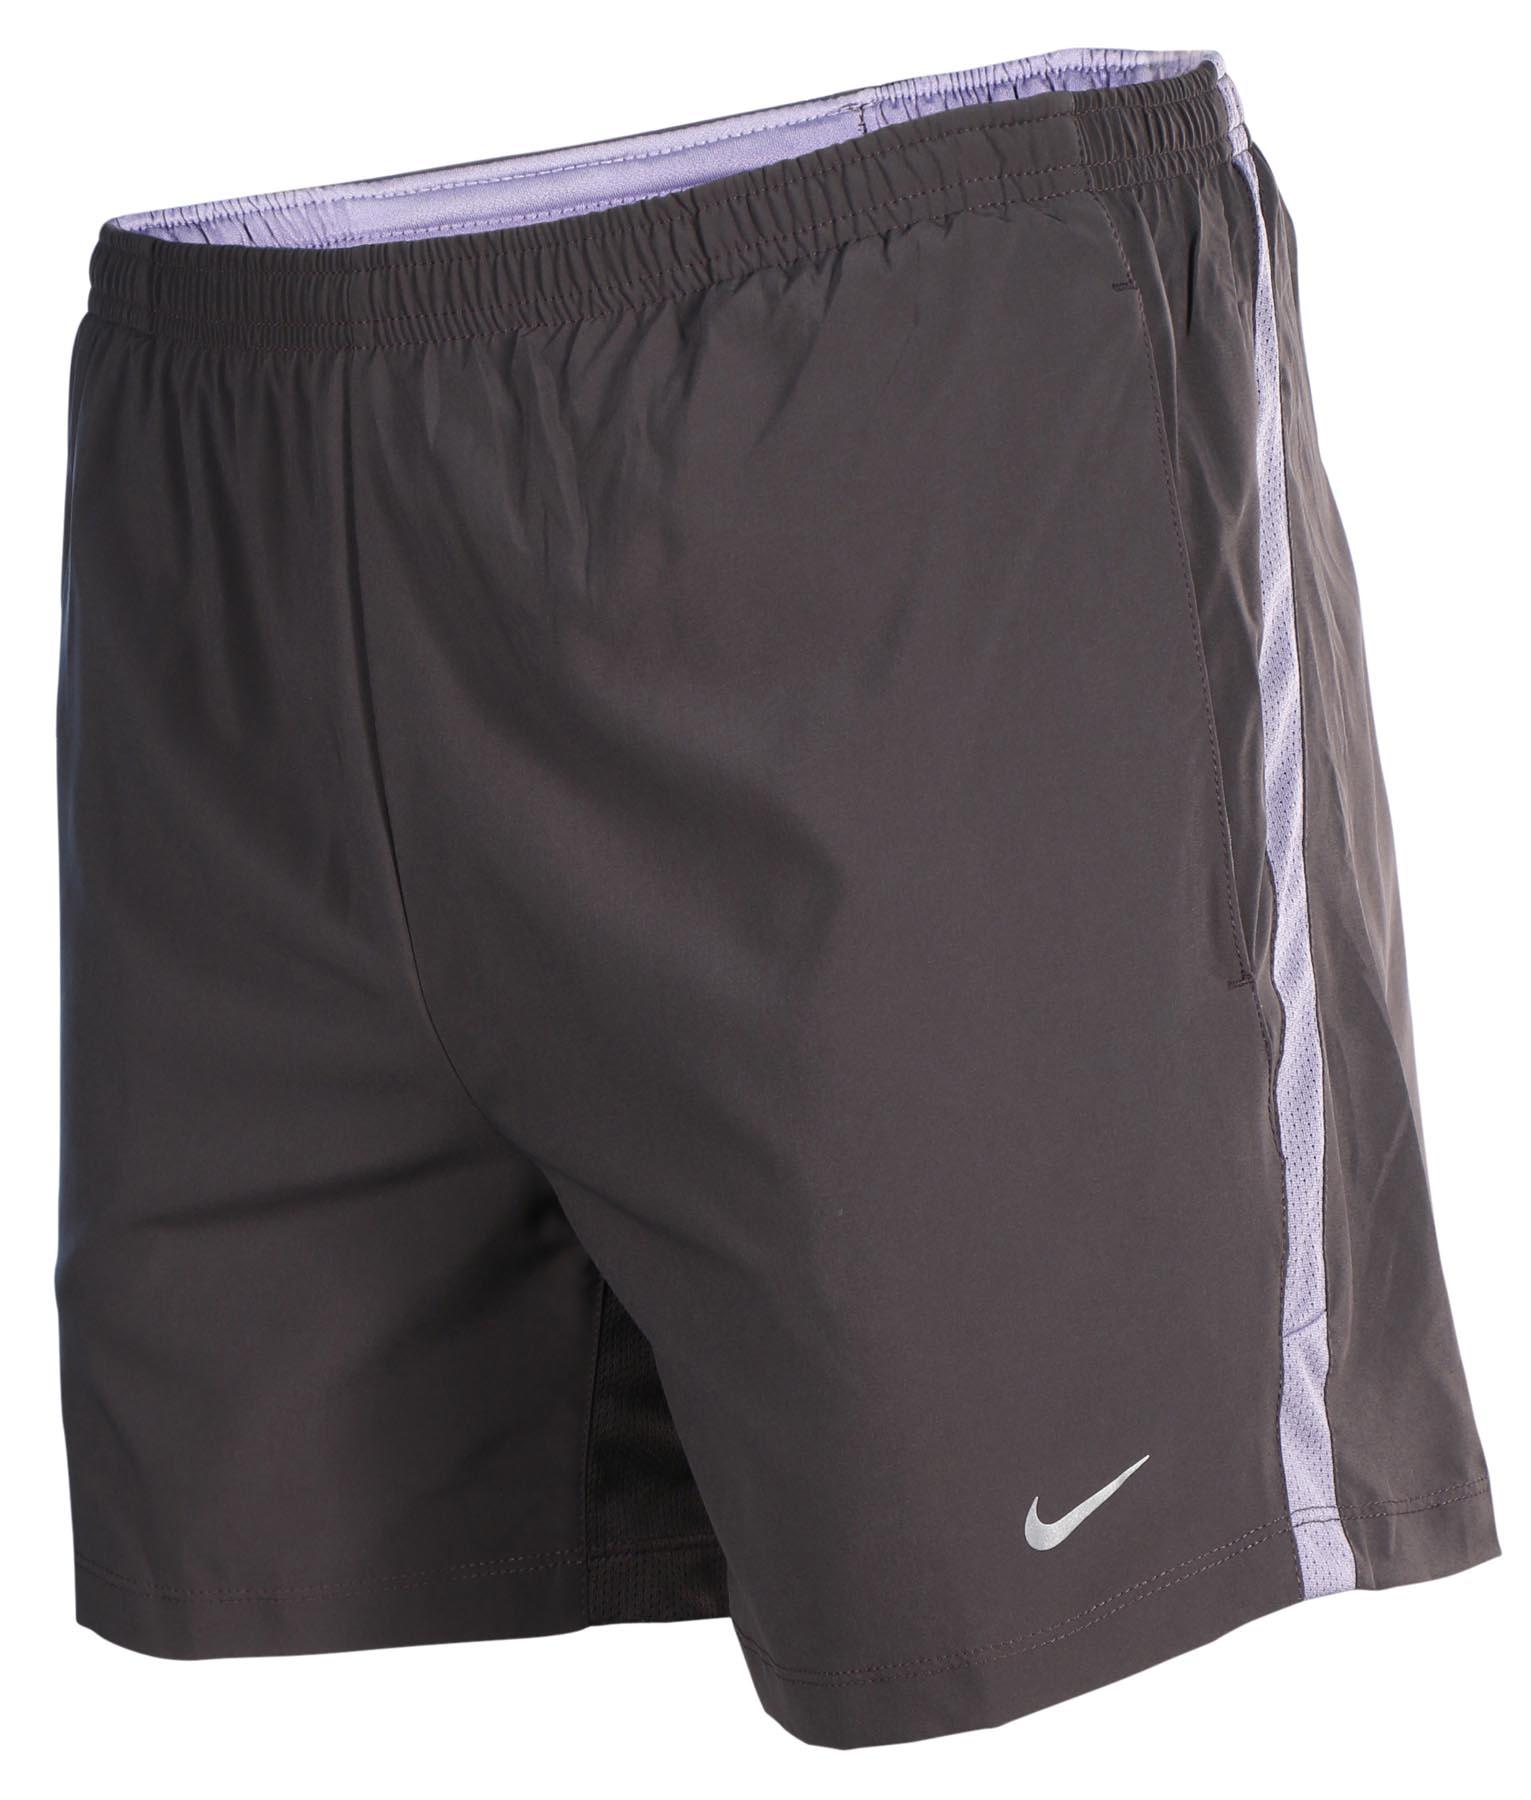 Nike Men's Dri-fit Woven 5 Distance Running Shorts